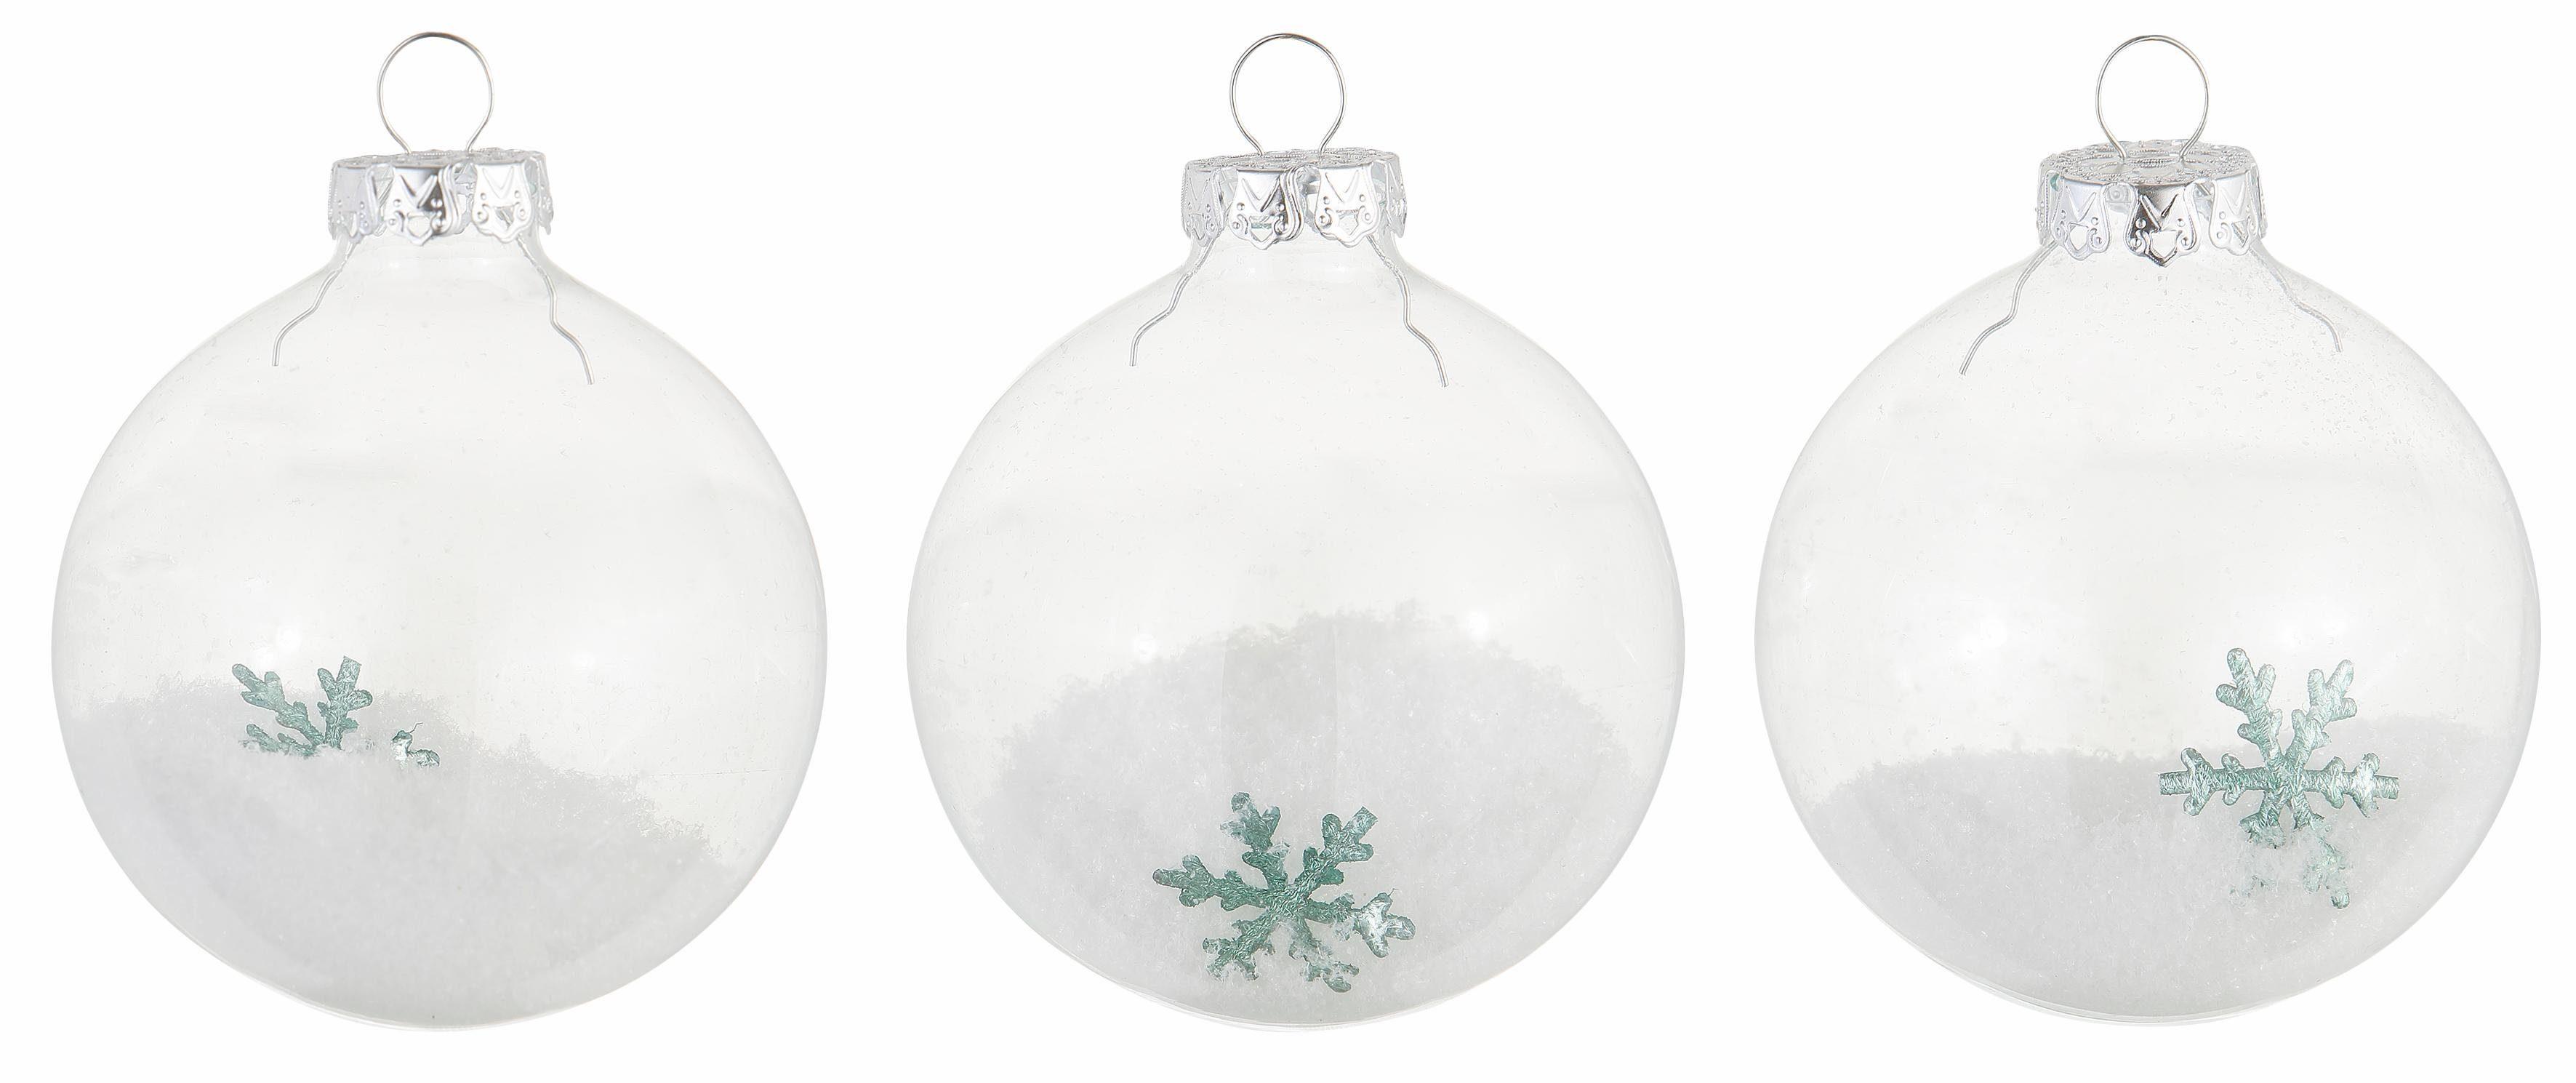 Thüringer Glasdesign TGS-Glaskugeln Transparent mit Schnee (3-teilg)